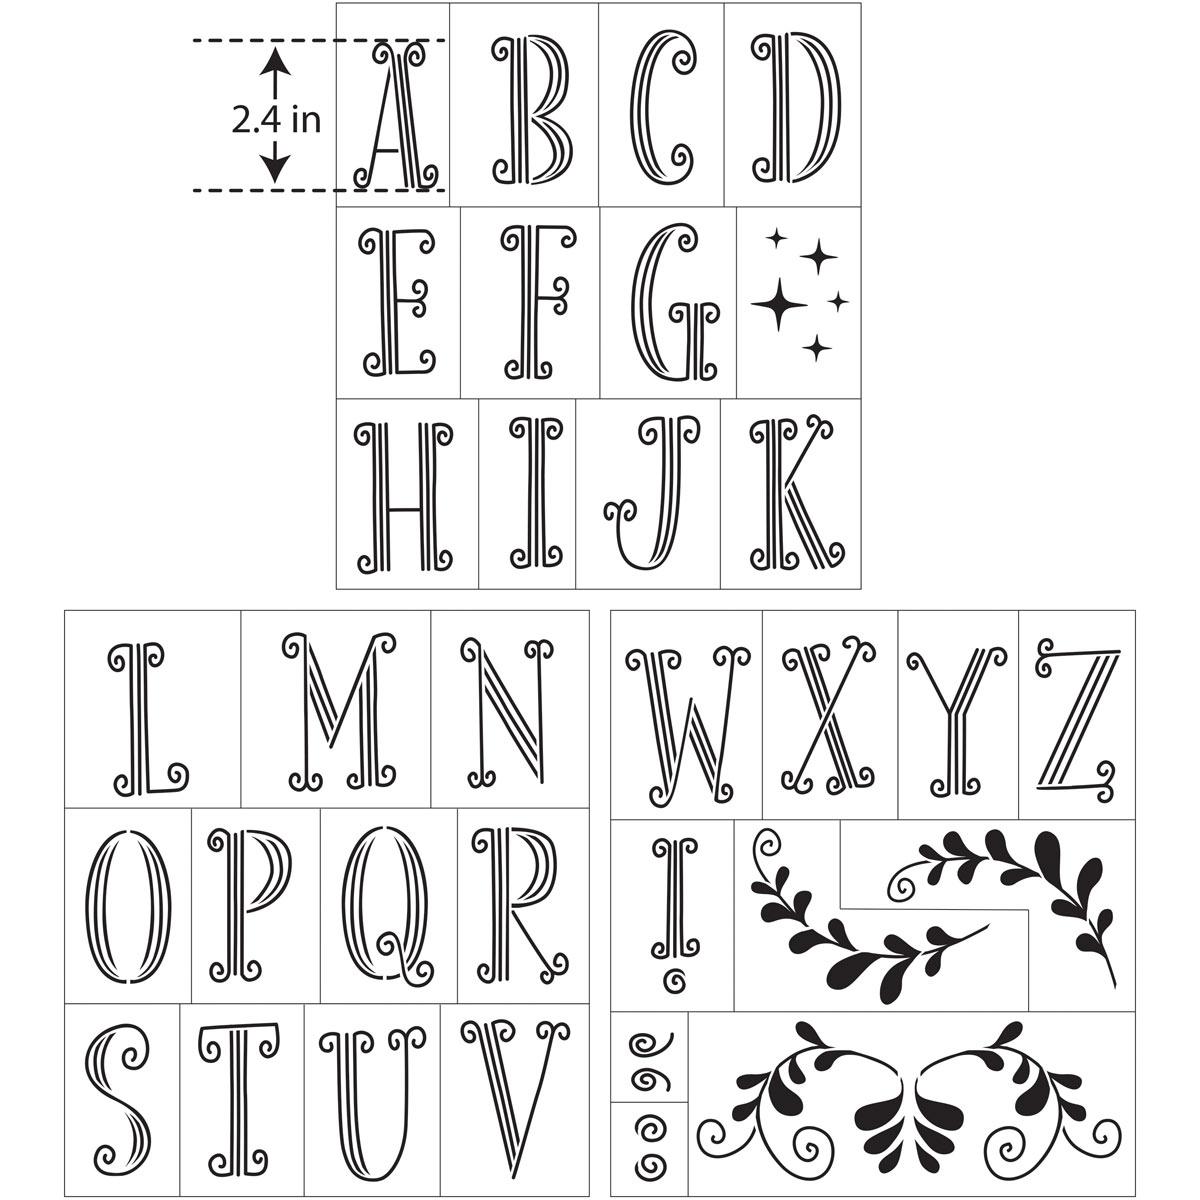 Hallmark Handcrafted Adhesive Stencils - Little Princess Font, 8-1/2